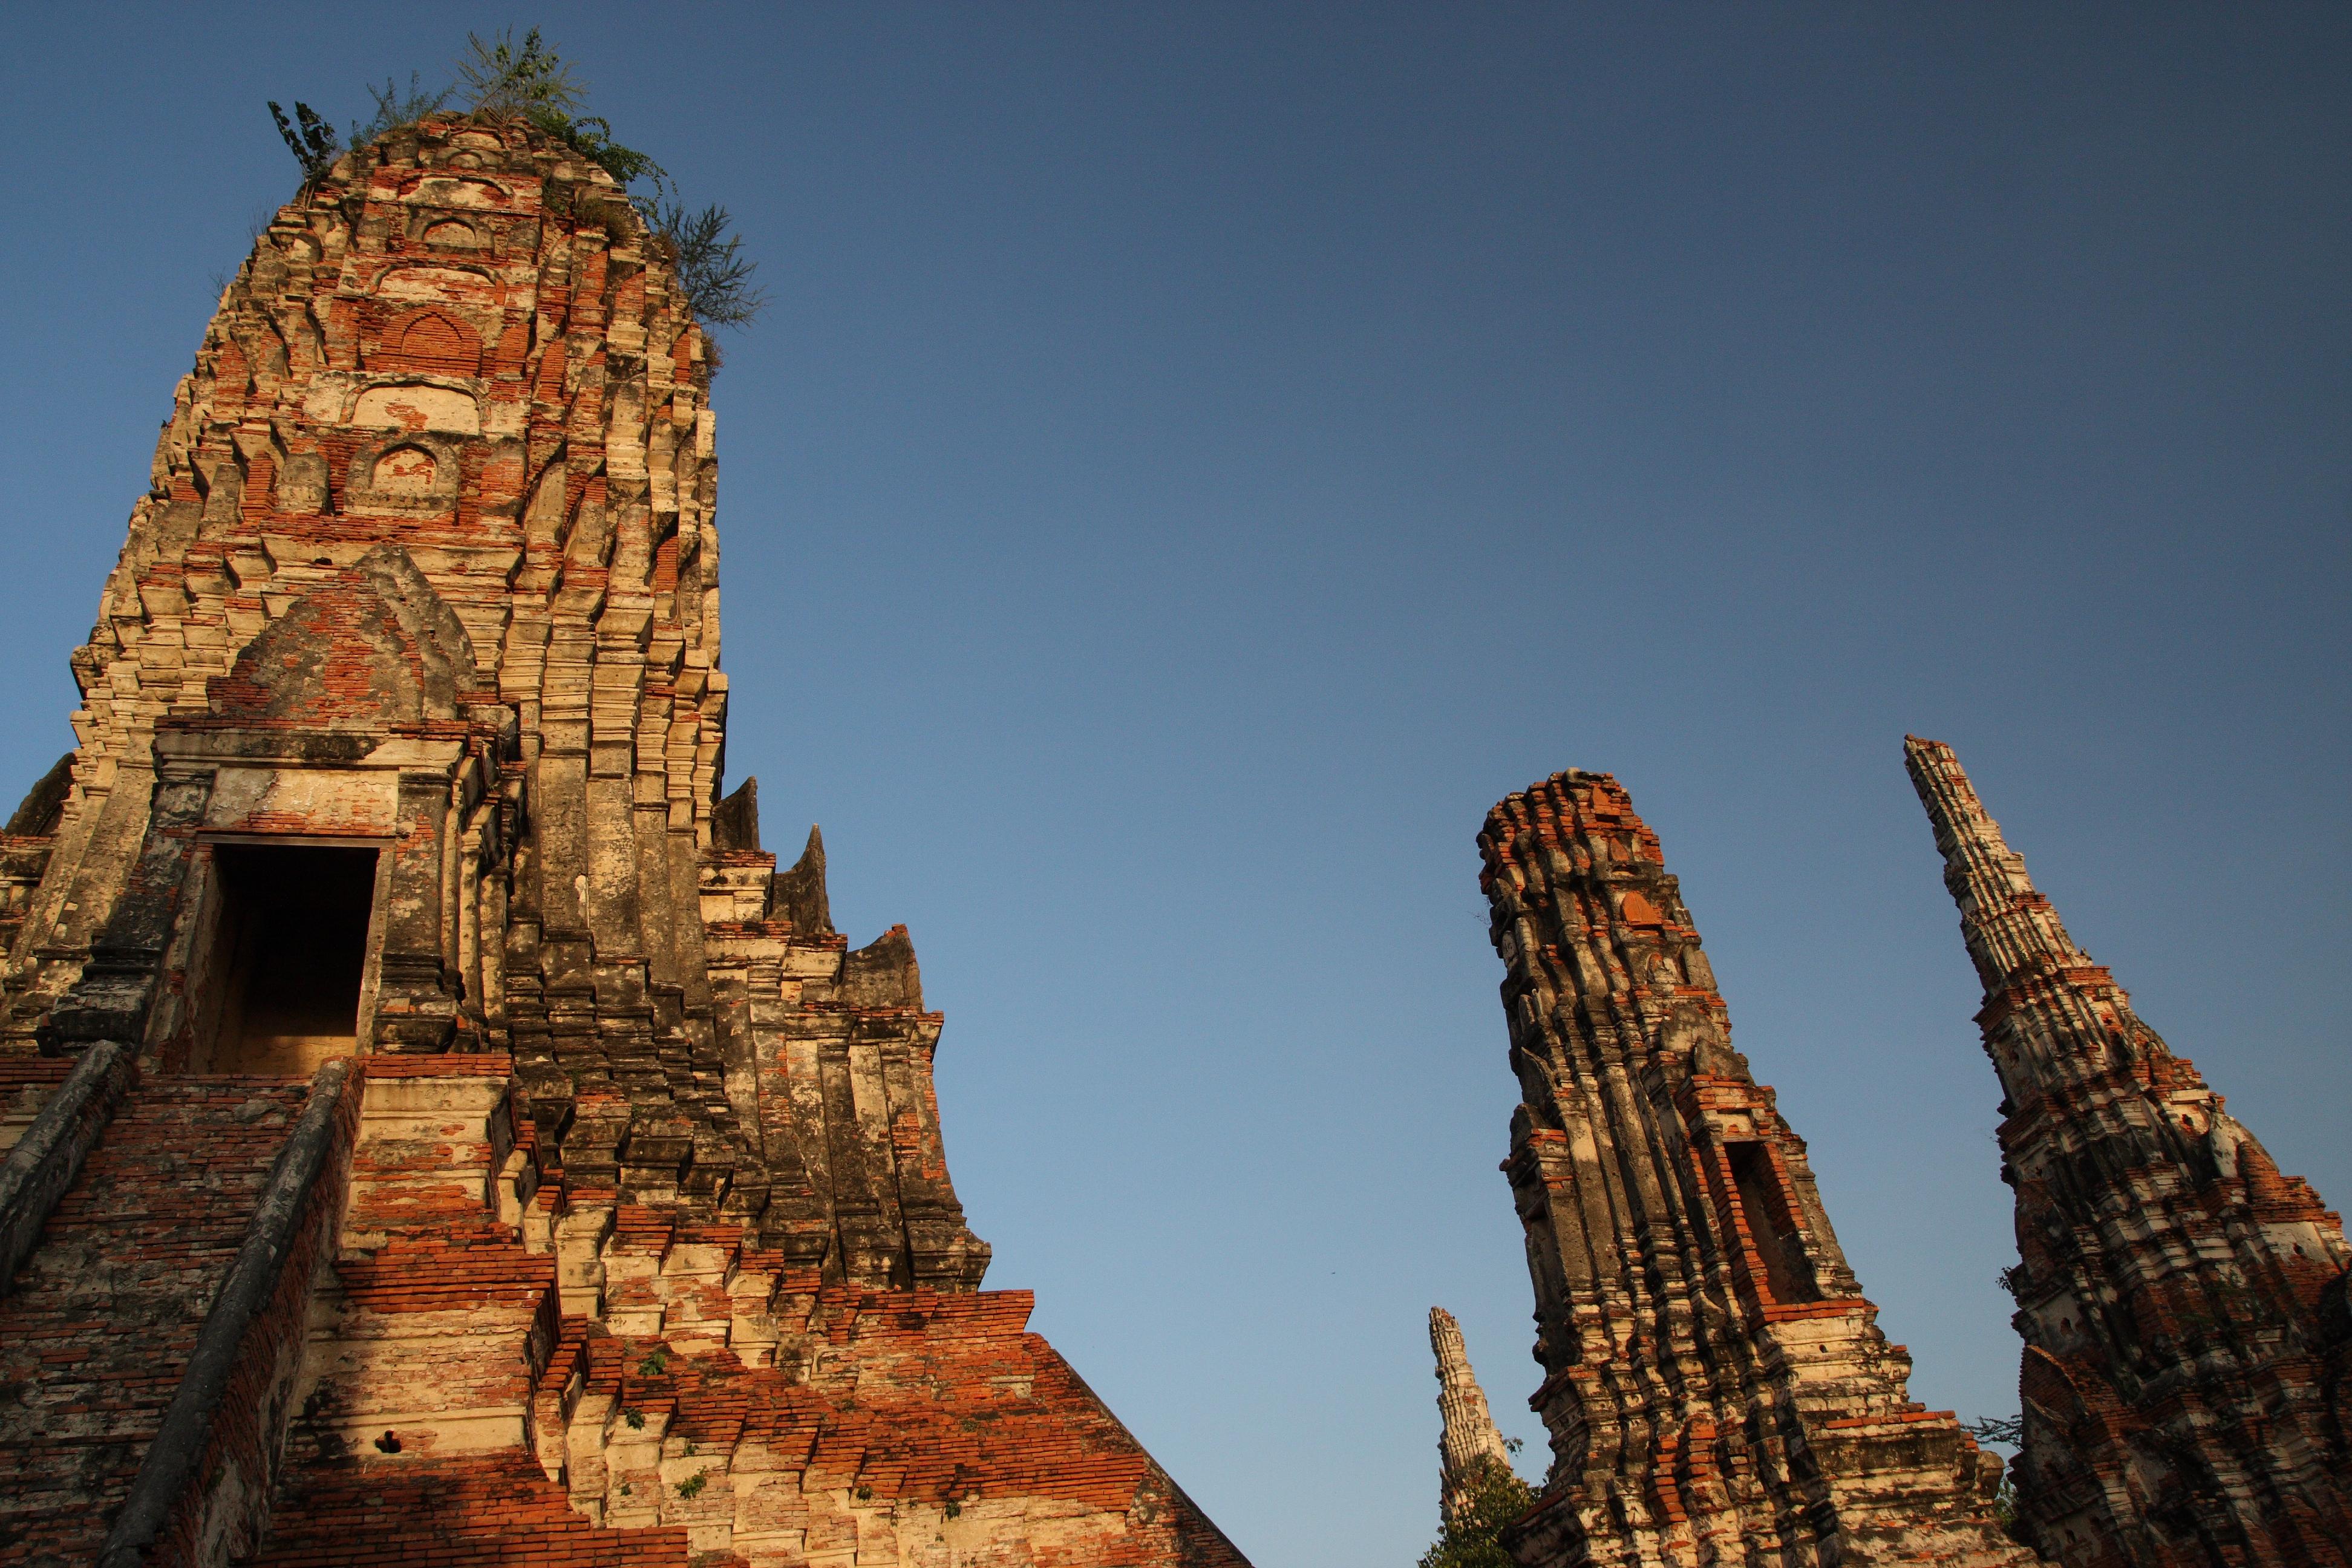 File:Wat Chaiwatthanaram, Ayutthaya, Thailand (5257457170).jpg